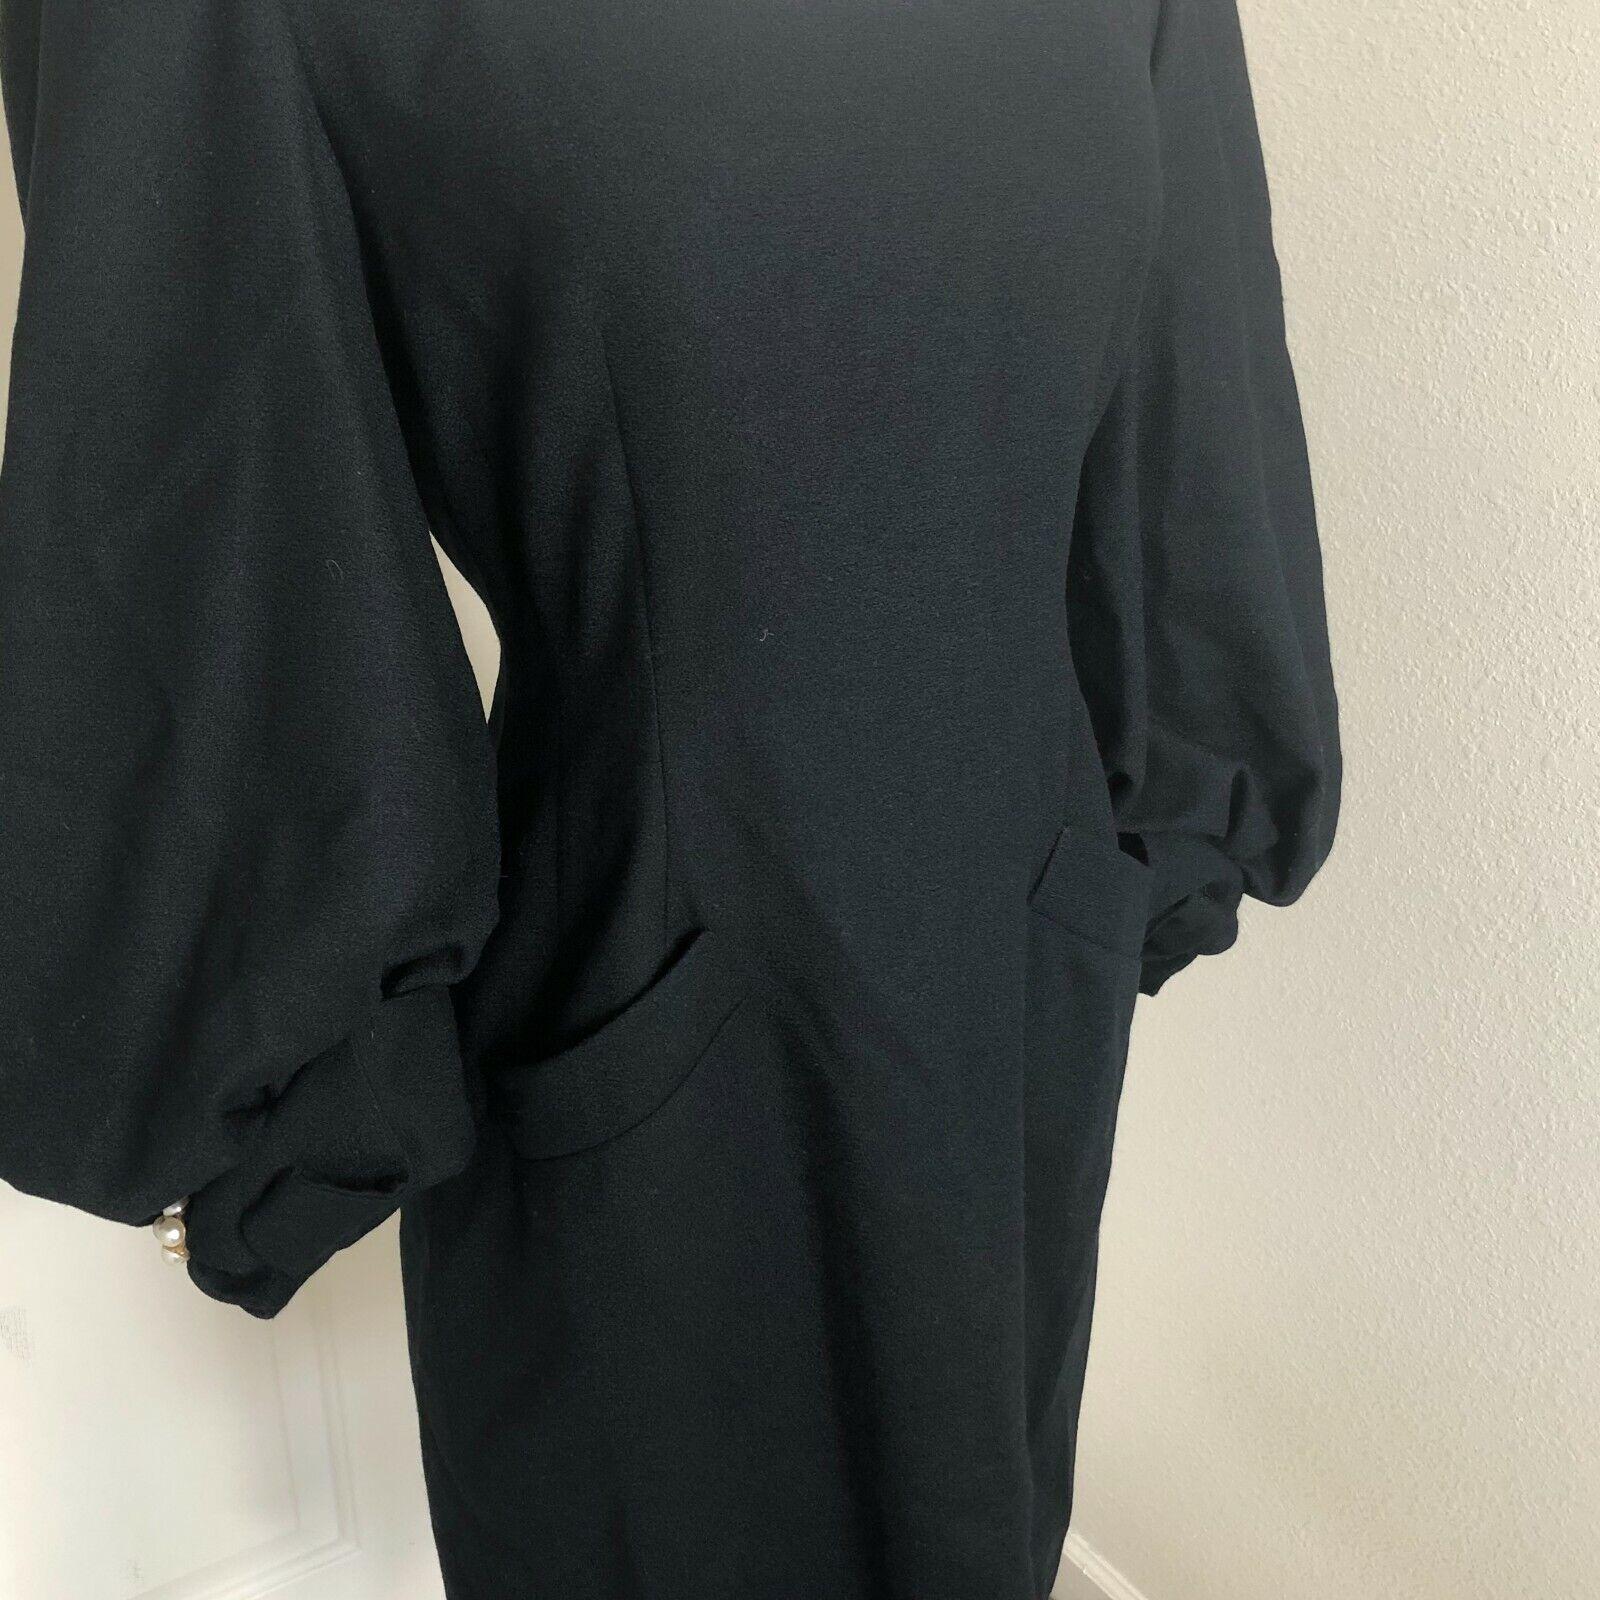 VTG 1980s Joanna Mastroianni 8 Black Wool Dress B… - image 4